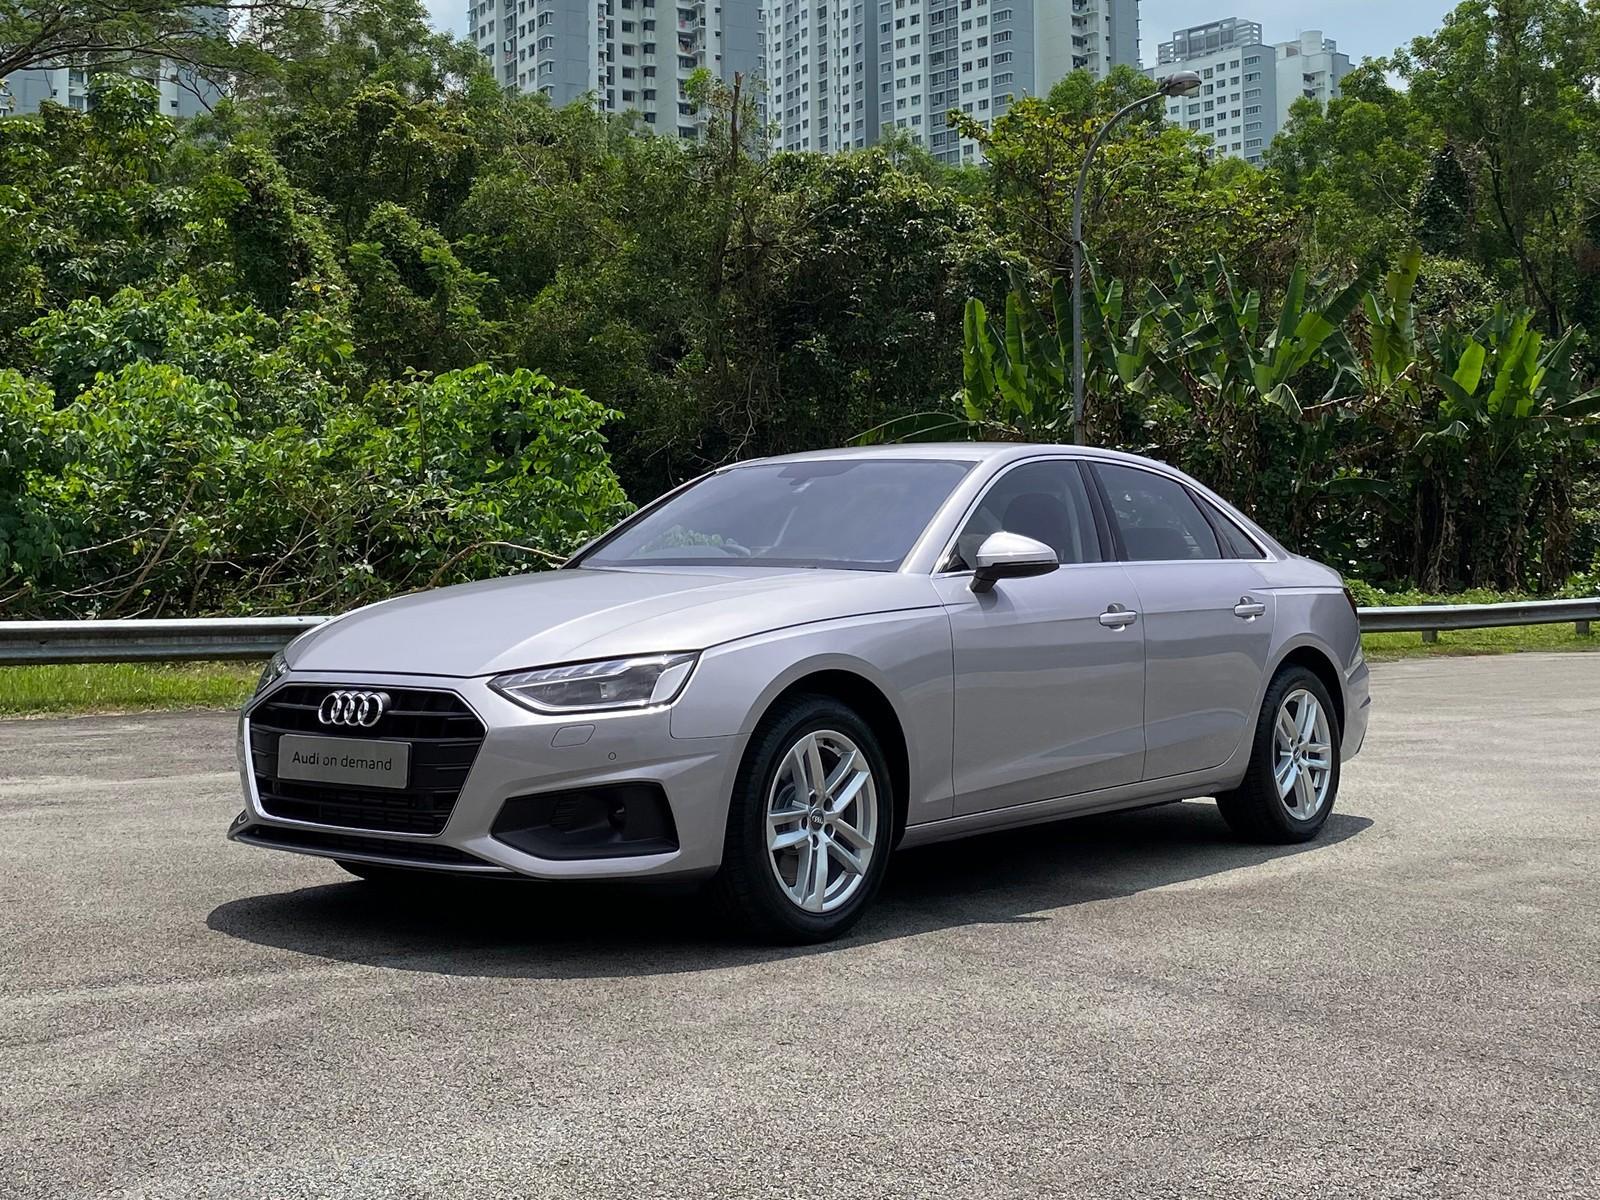 Audi A4 Sedan 2.0 TFSI (For Rent)